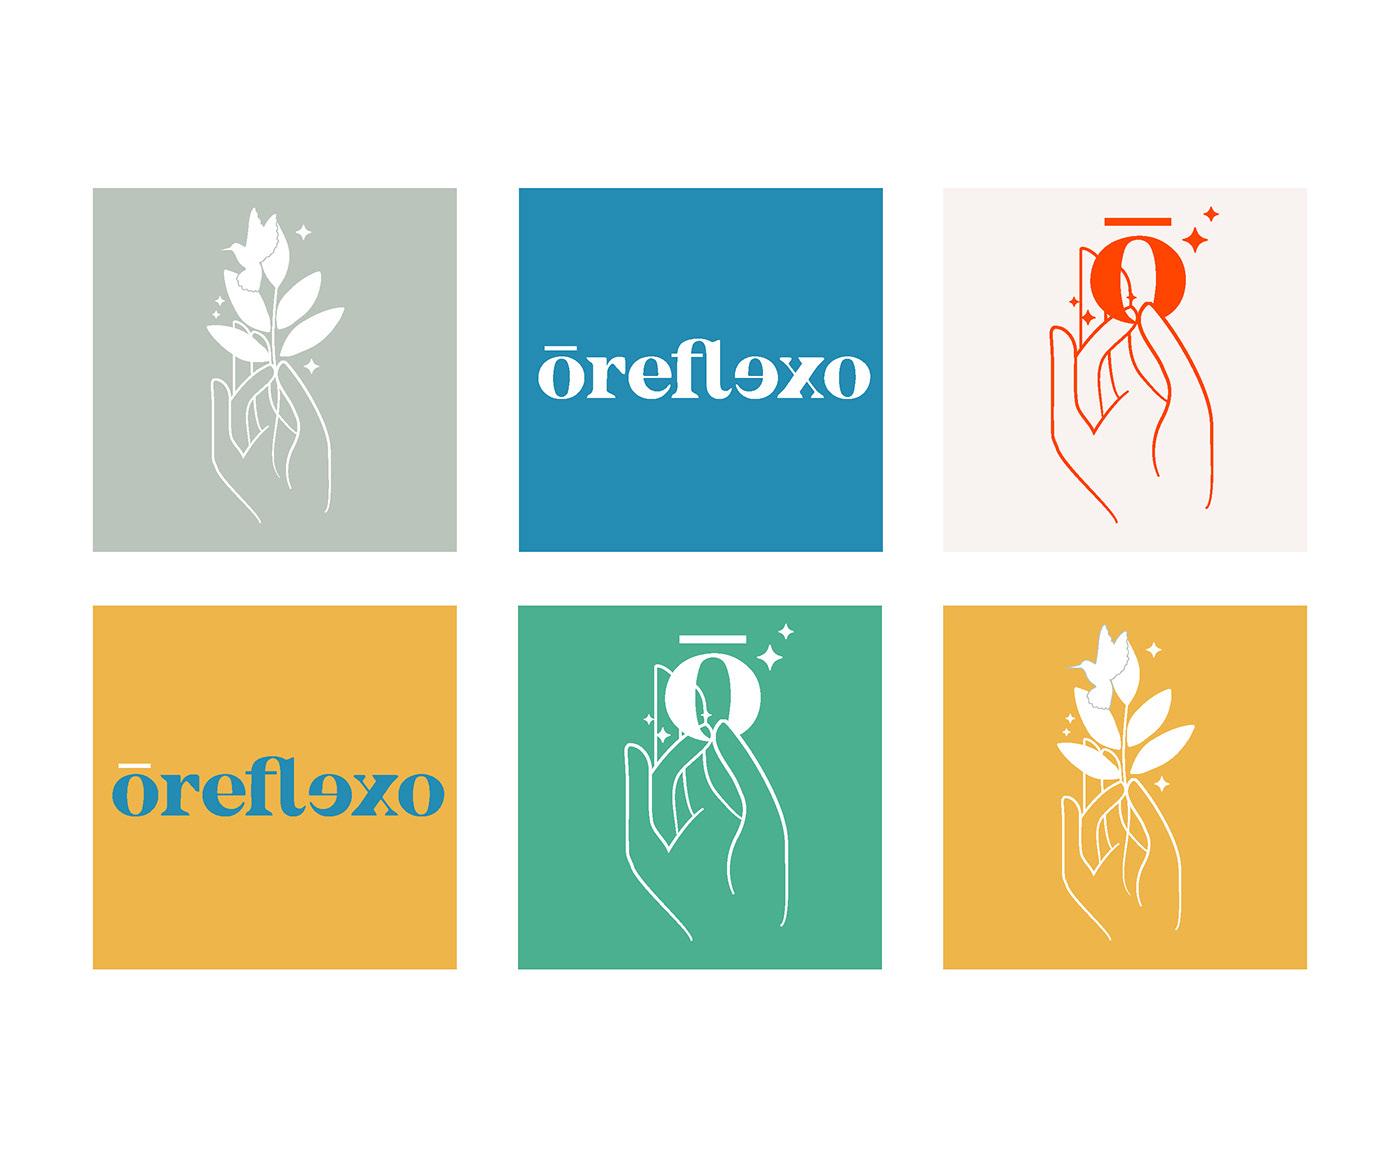 reflexologie global identity logo design graphique